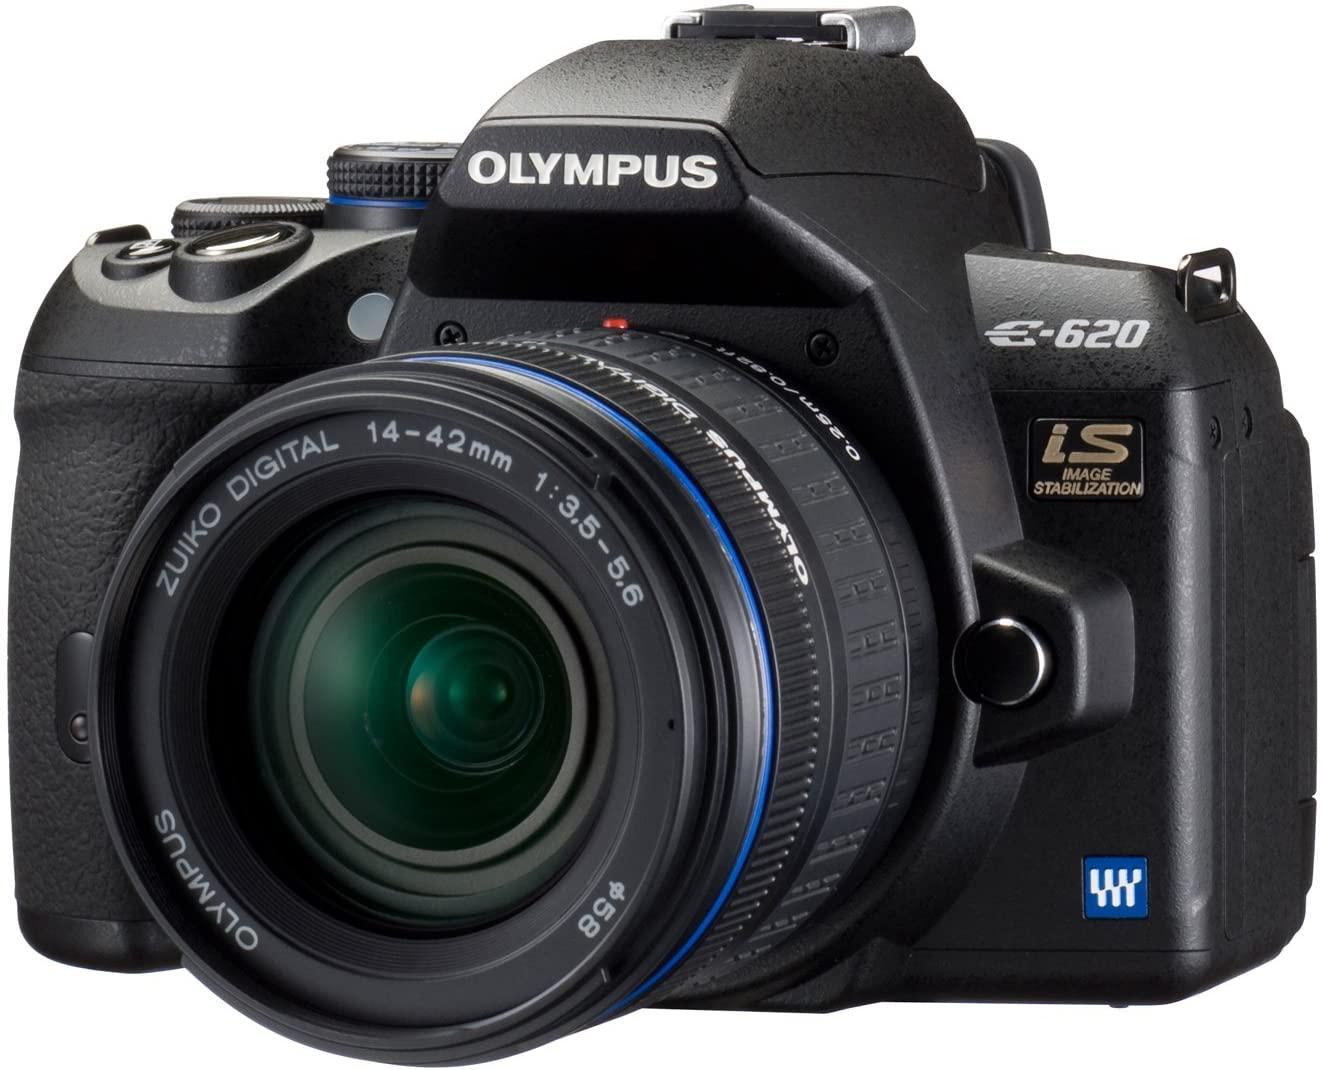 Olympus E-620 Camera